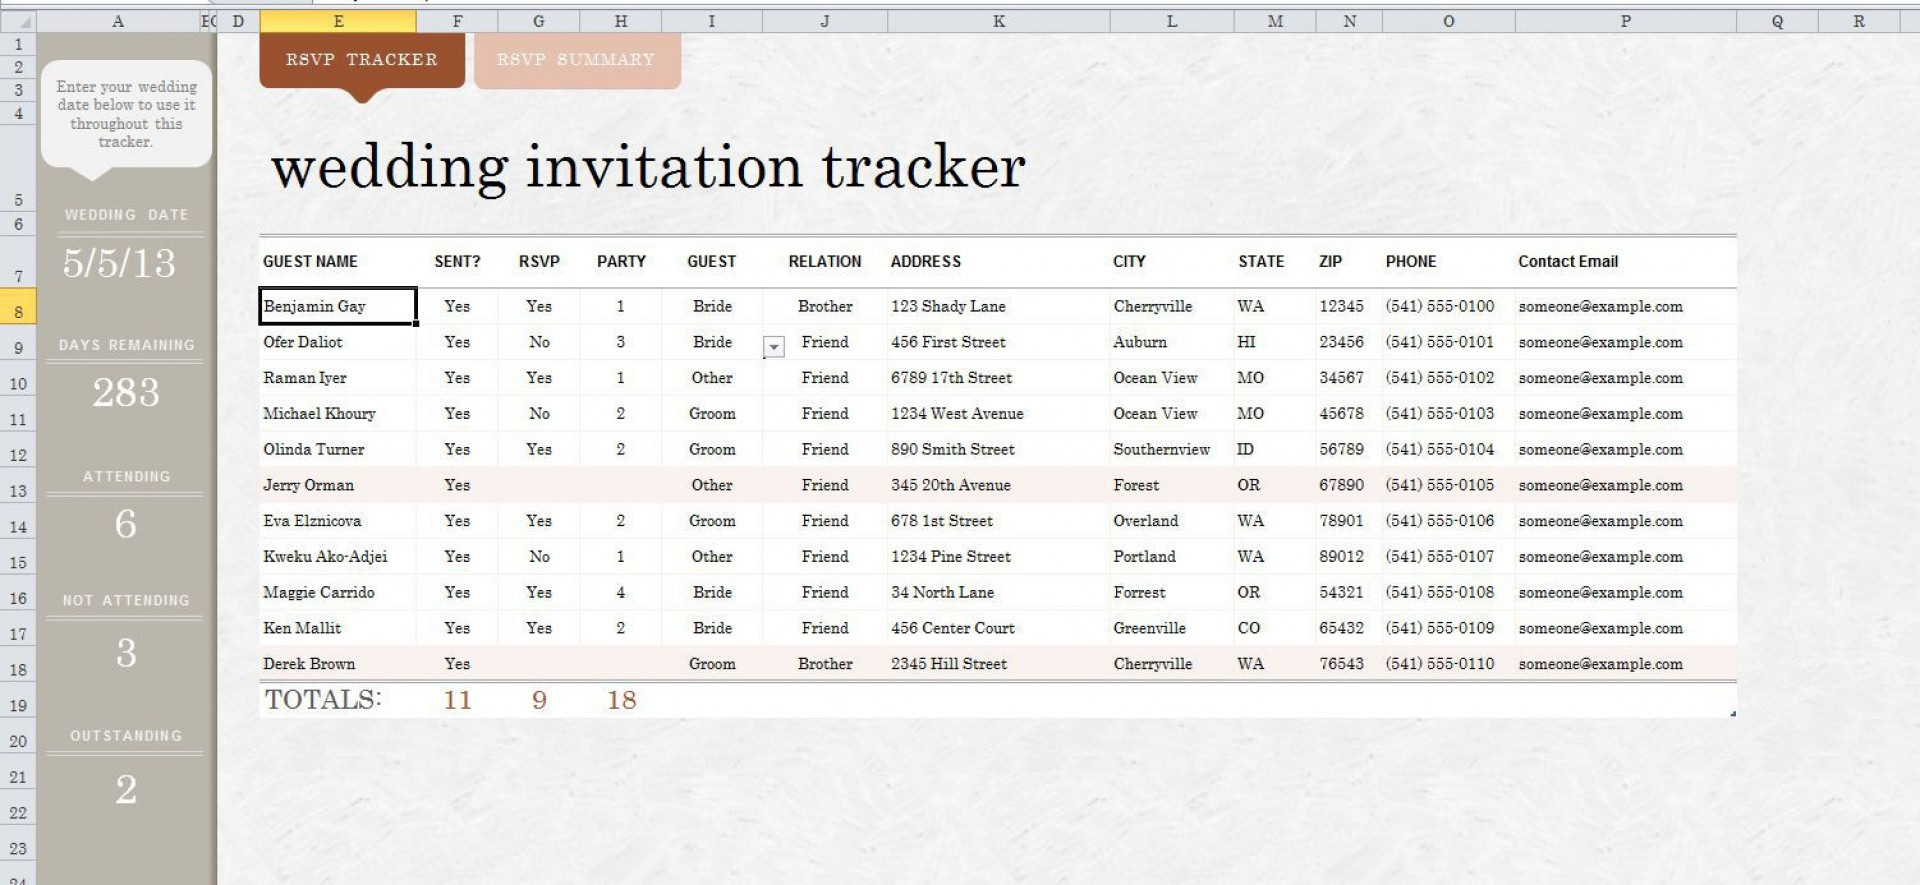 008 Surprising Rsvp Guest List Template Excel Picture 1920